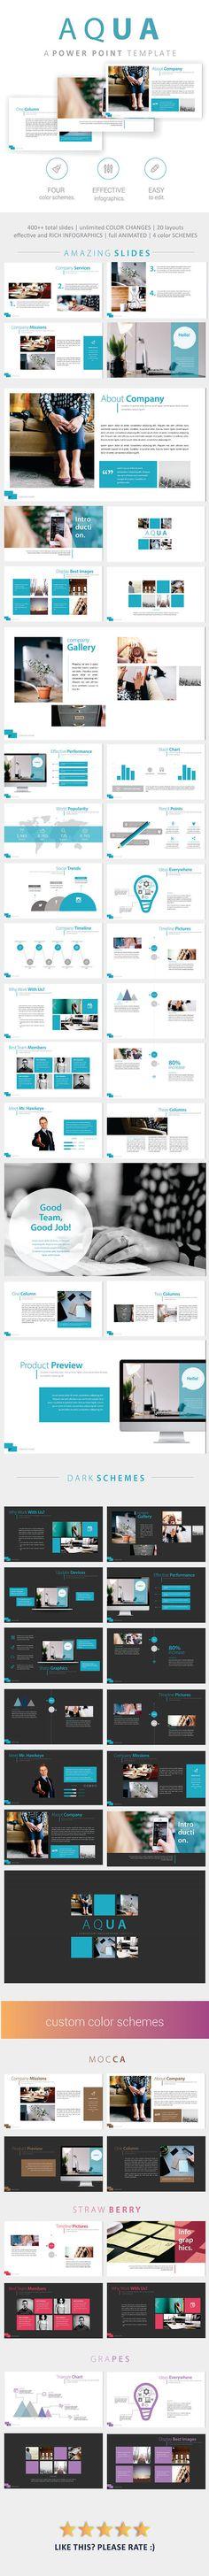 Aqua PowerPoint Presentation Template #design #slides Download: http://graphicriver.net/item/aqua-powerpoint-template/14017787?ref=ksioks